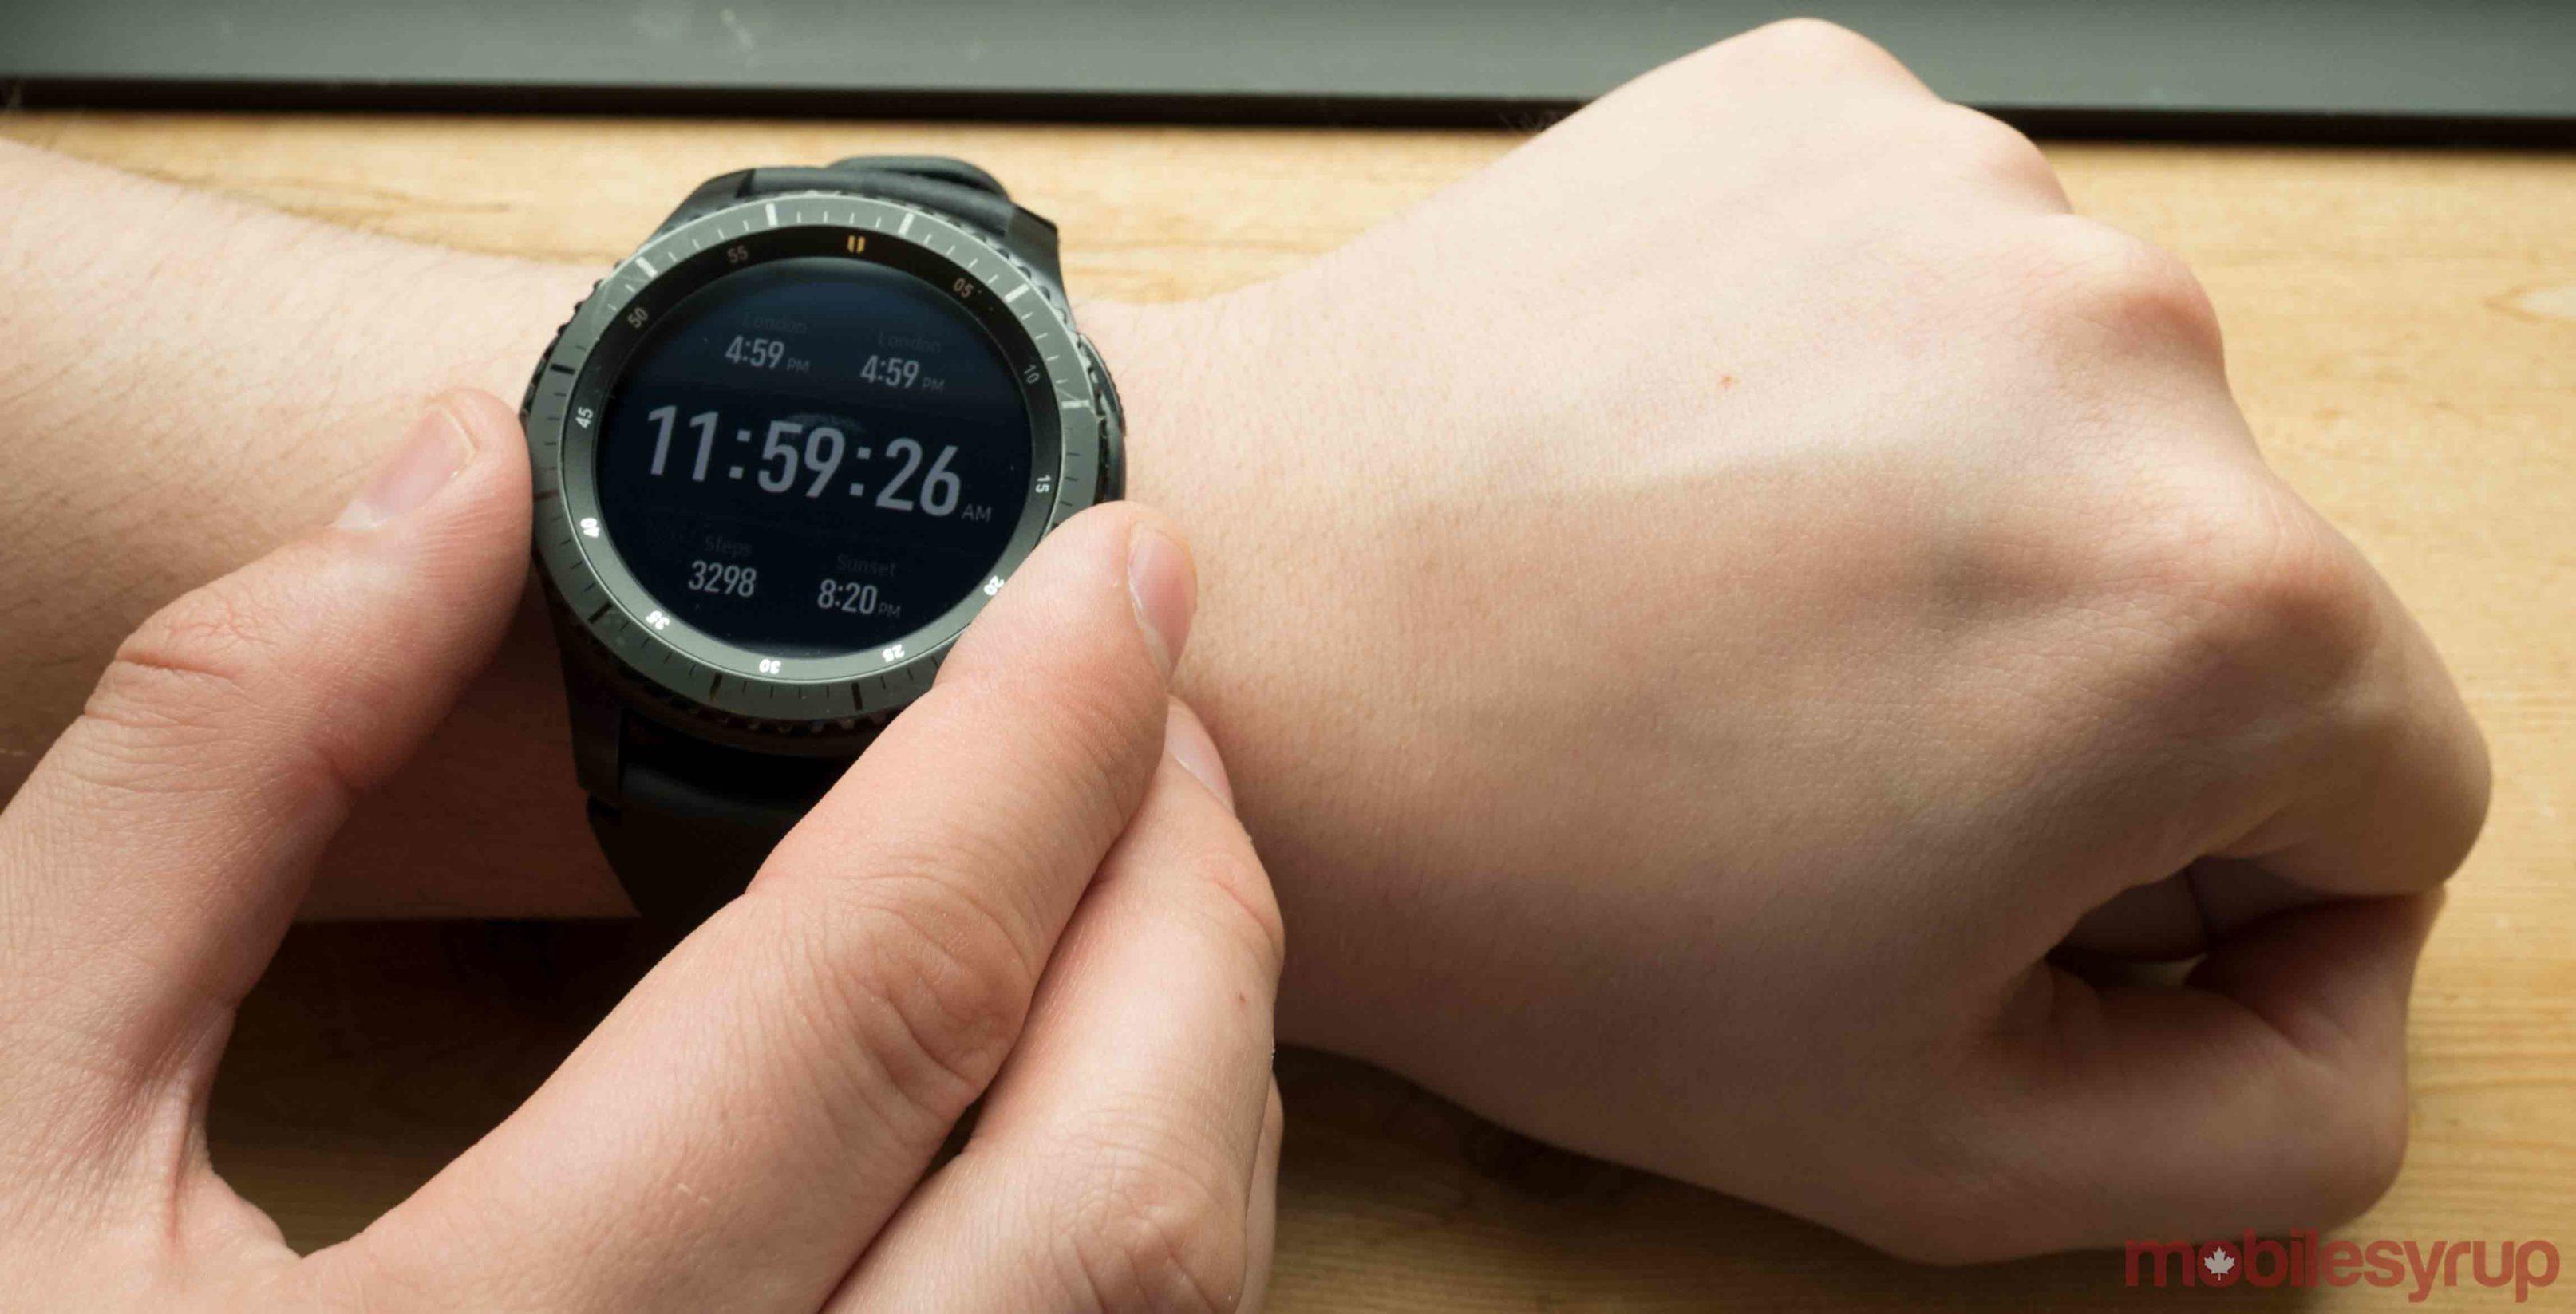 Samsung Gear S3 on wrist